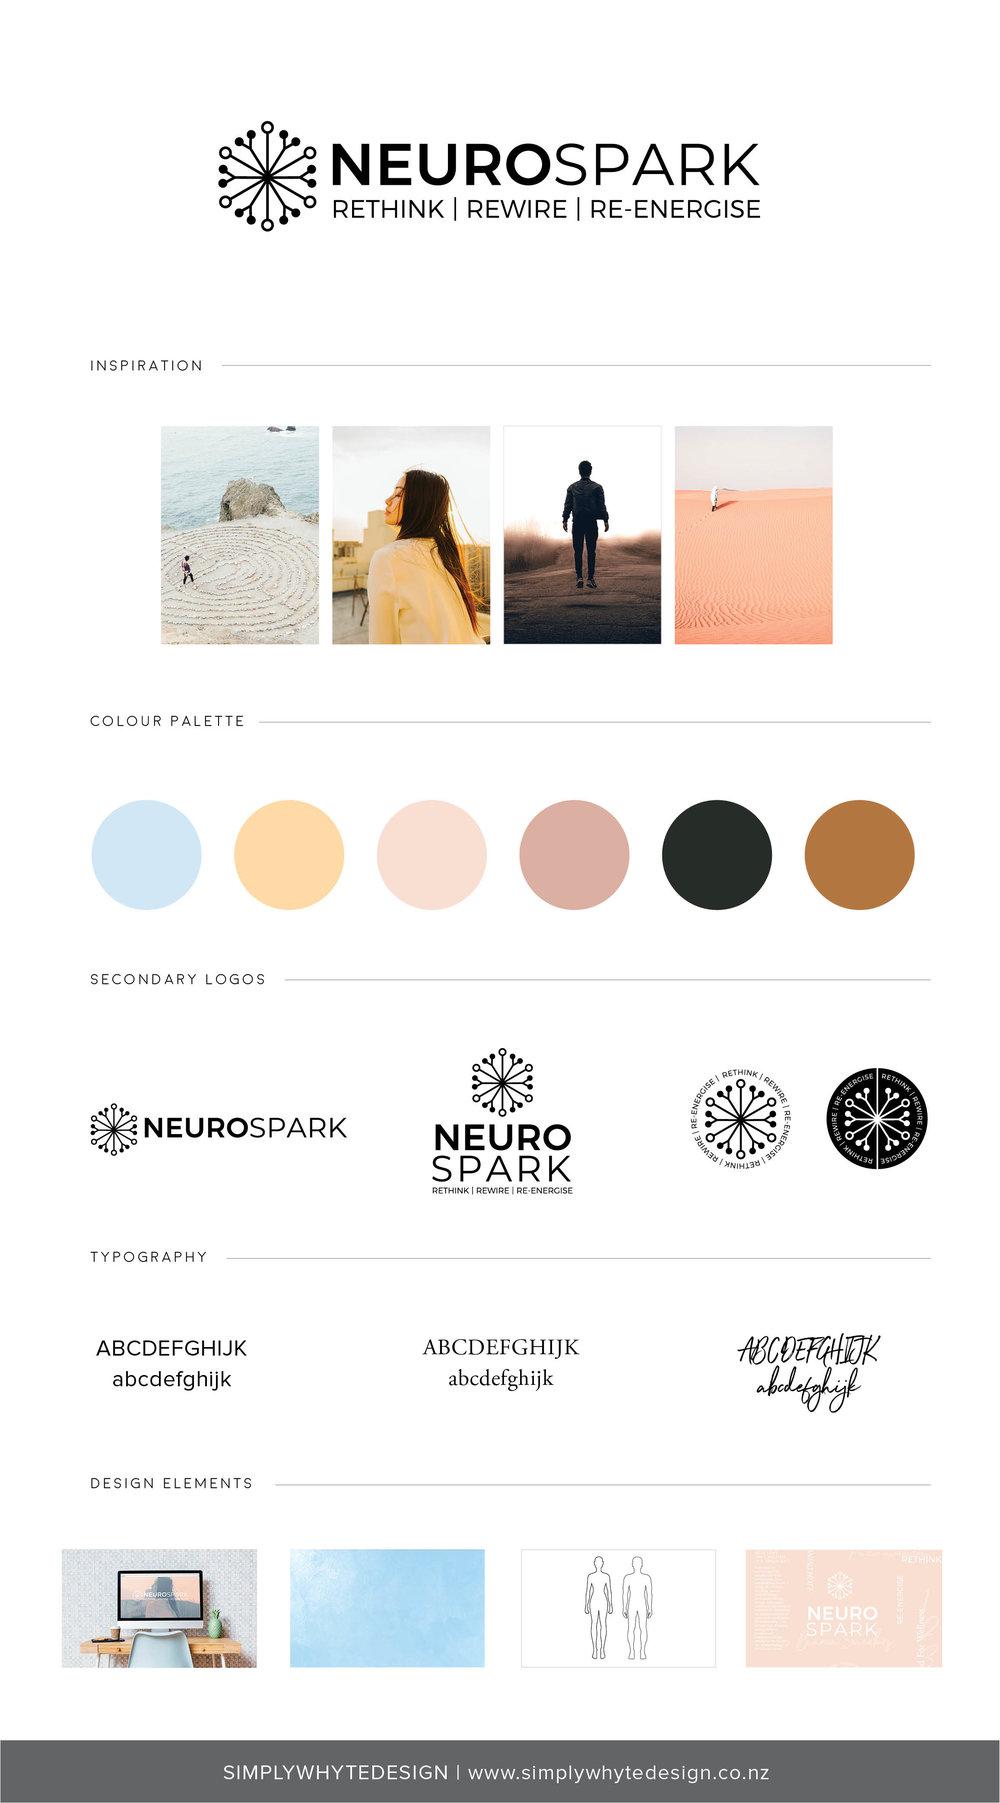 neurospark-logo-design--brand-board-simply-whyte-design